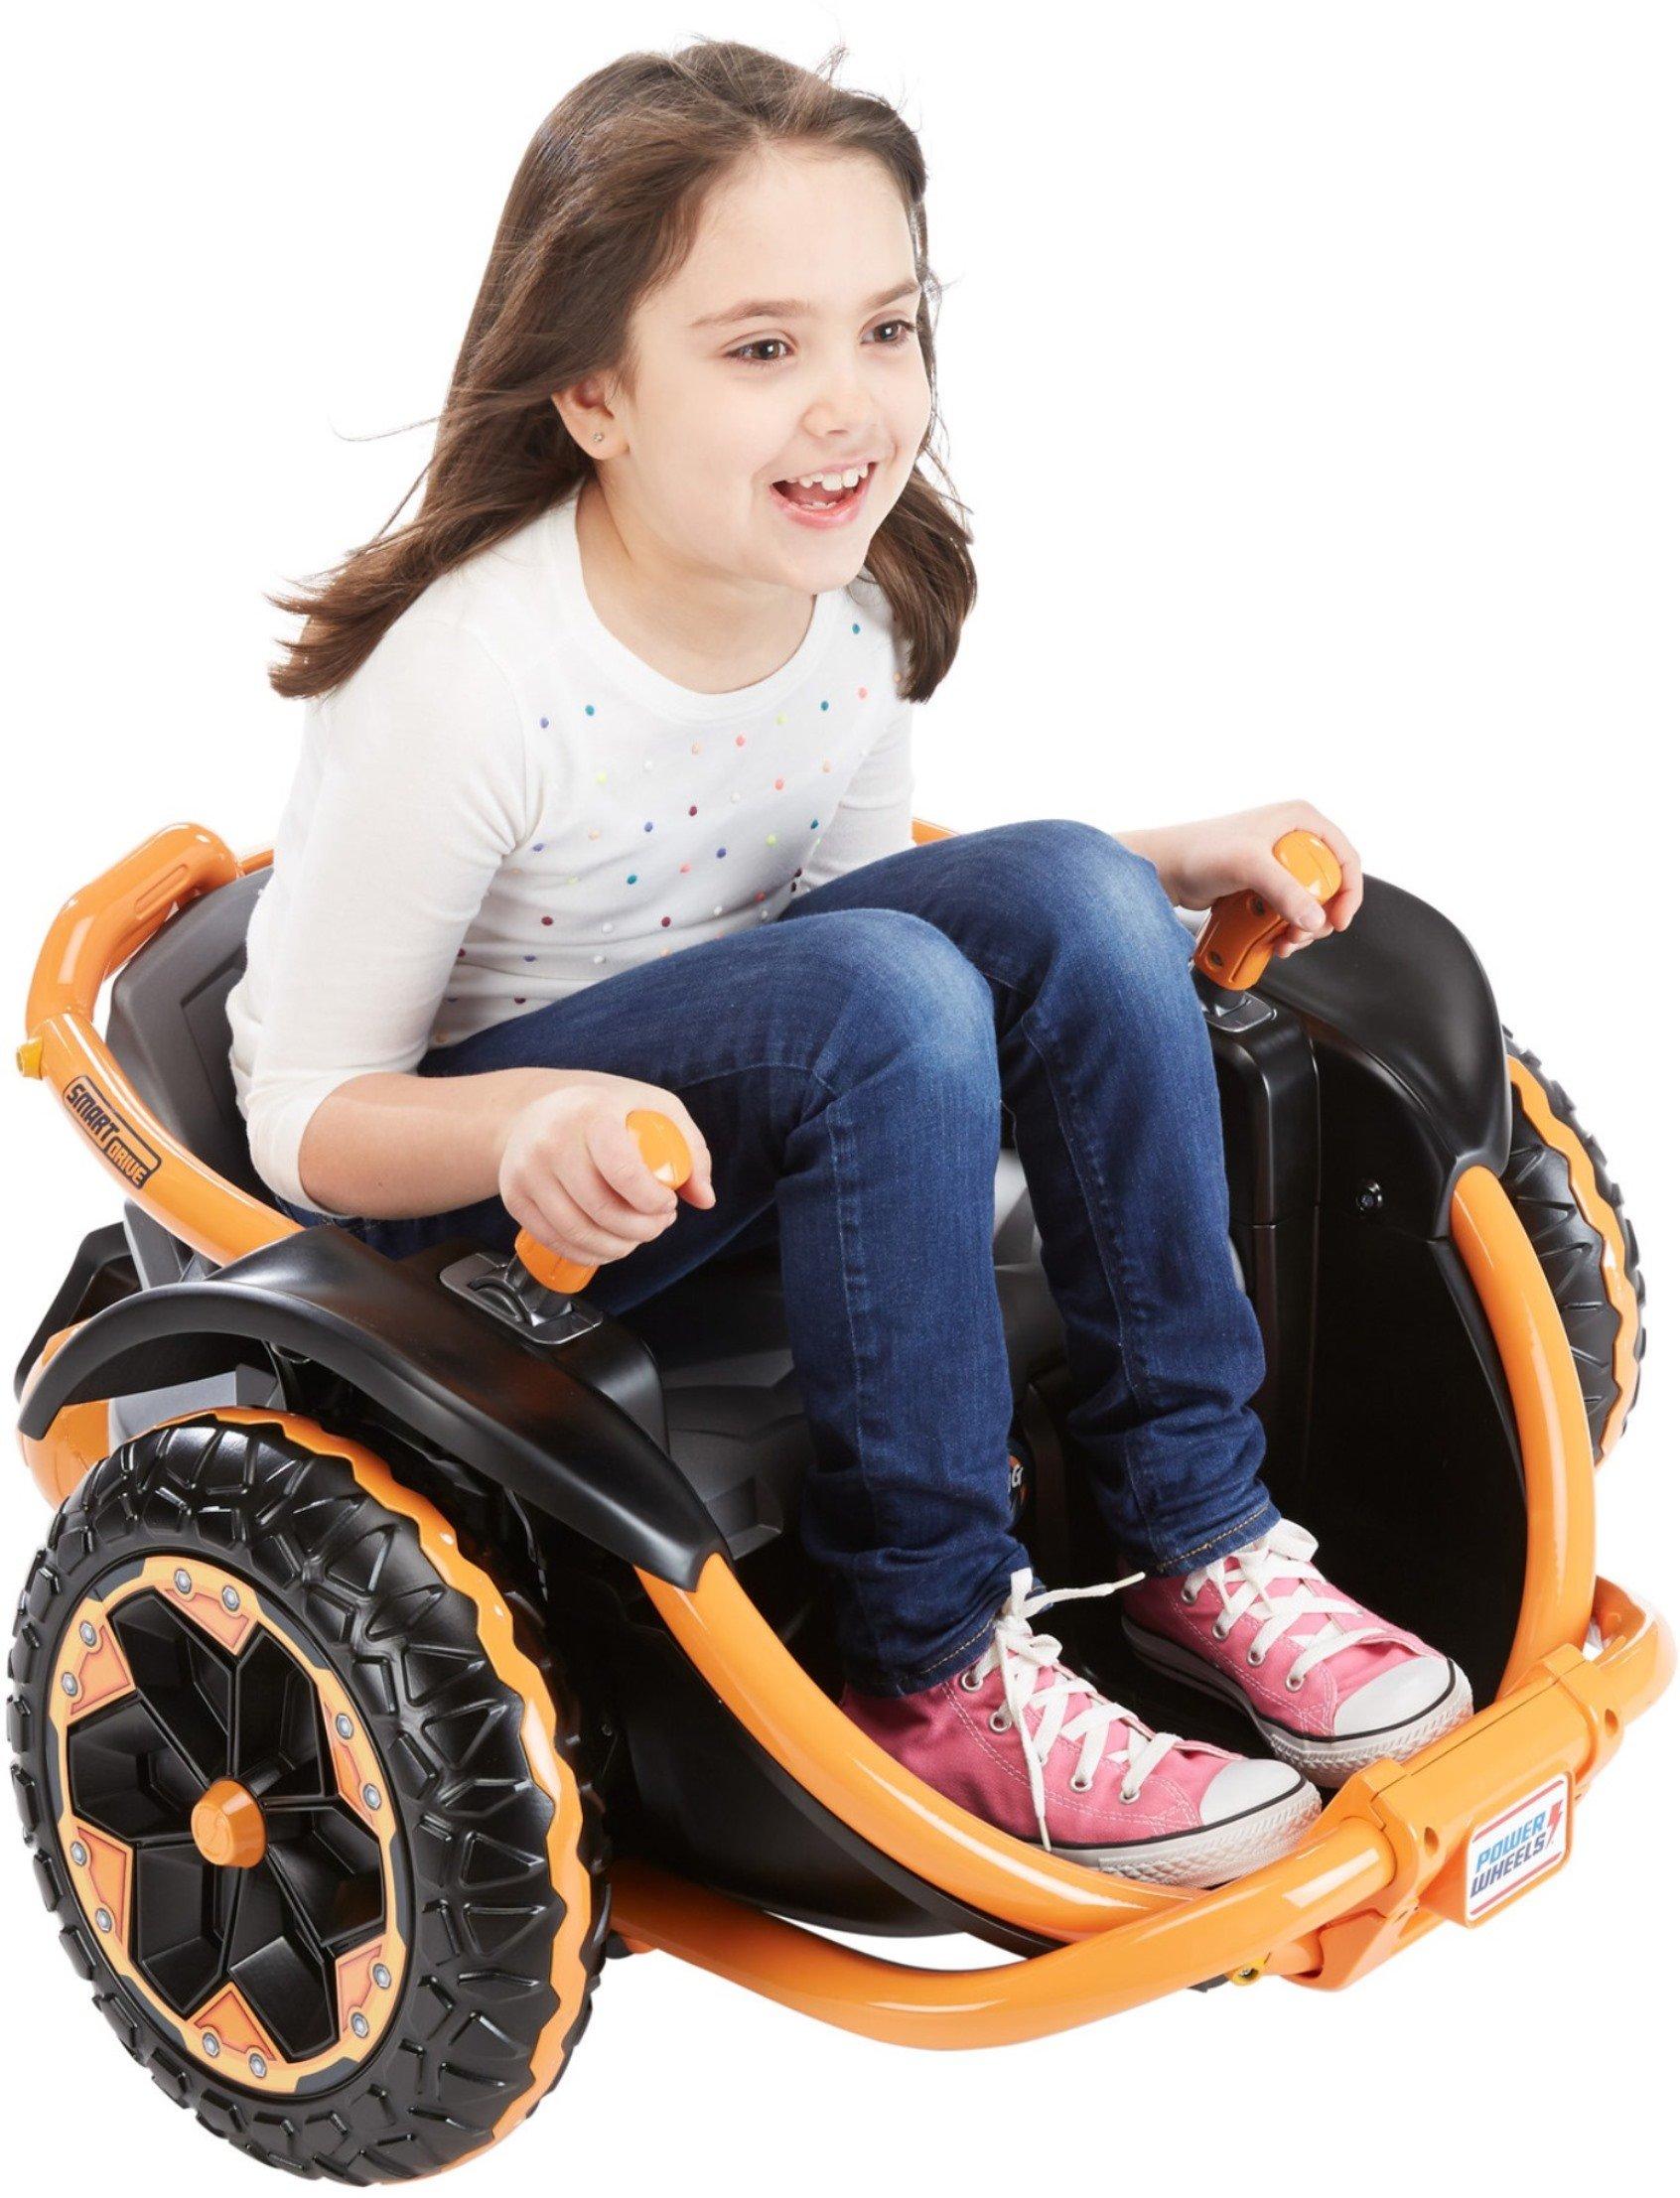 Fisher-Price Power Wheels Wild Thing, Orange by Fisher-Price